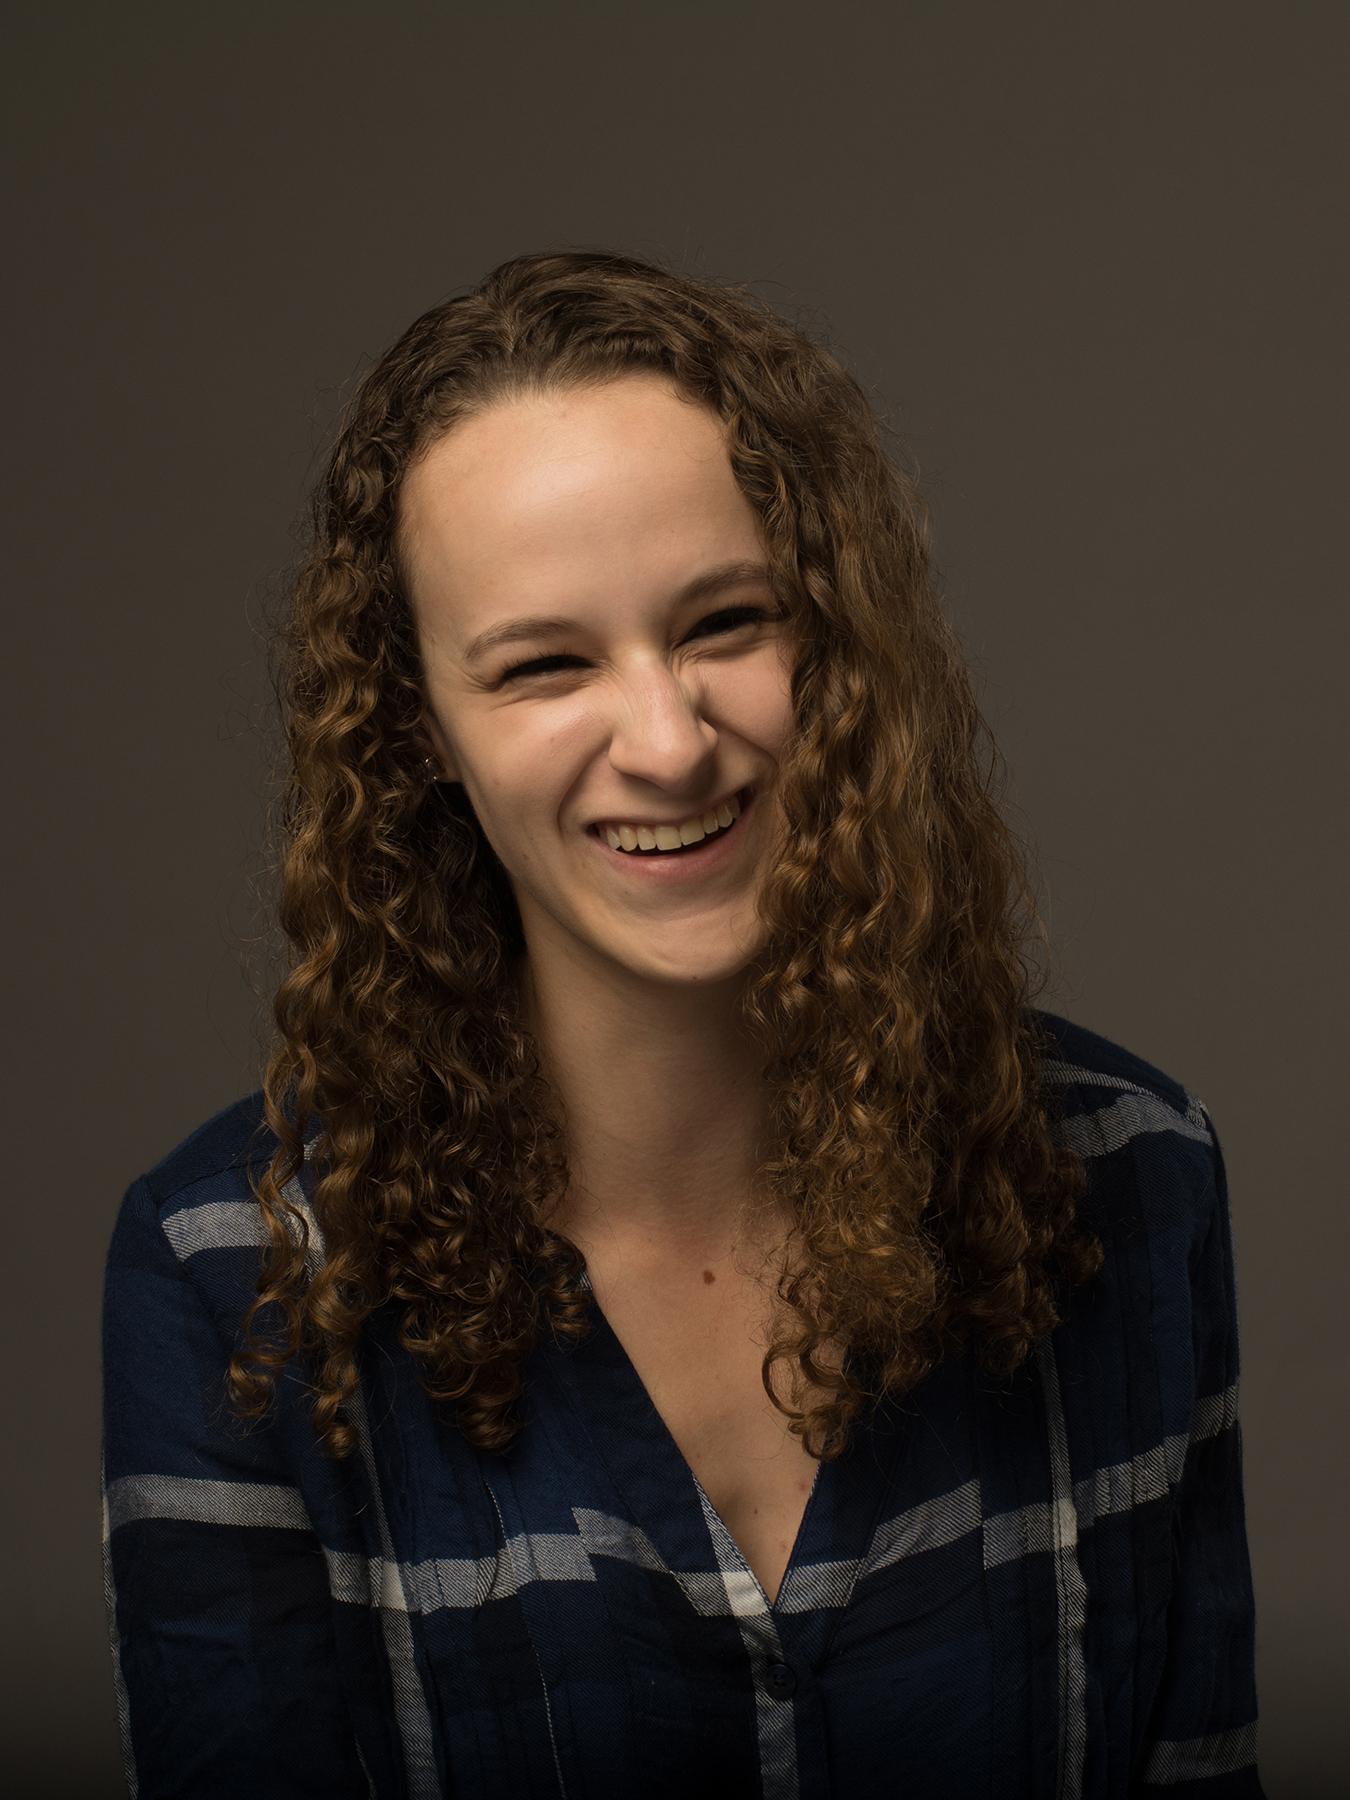 Ariel Blackman — Outstanding Undergraduate